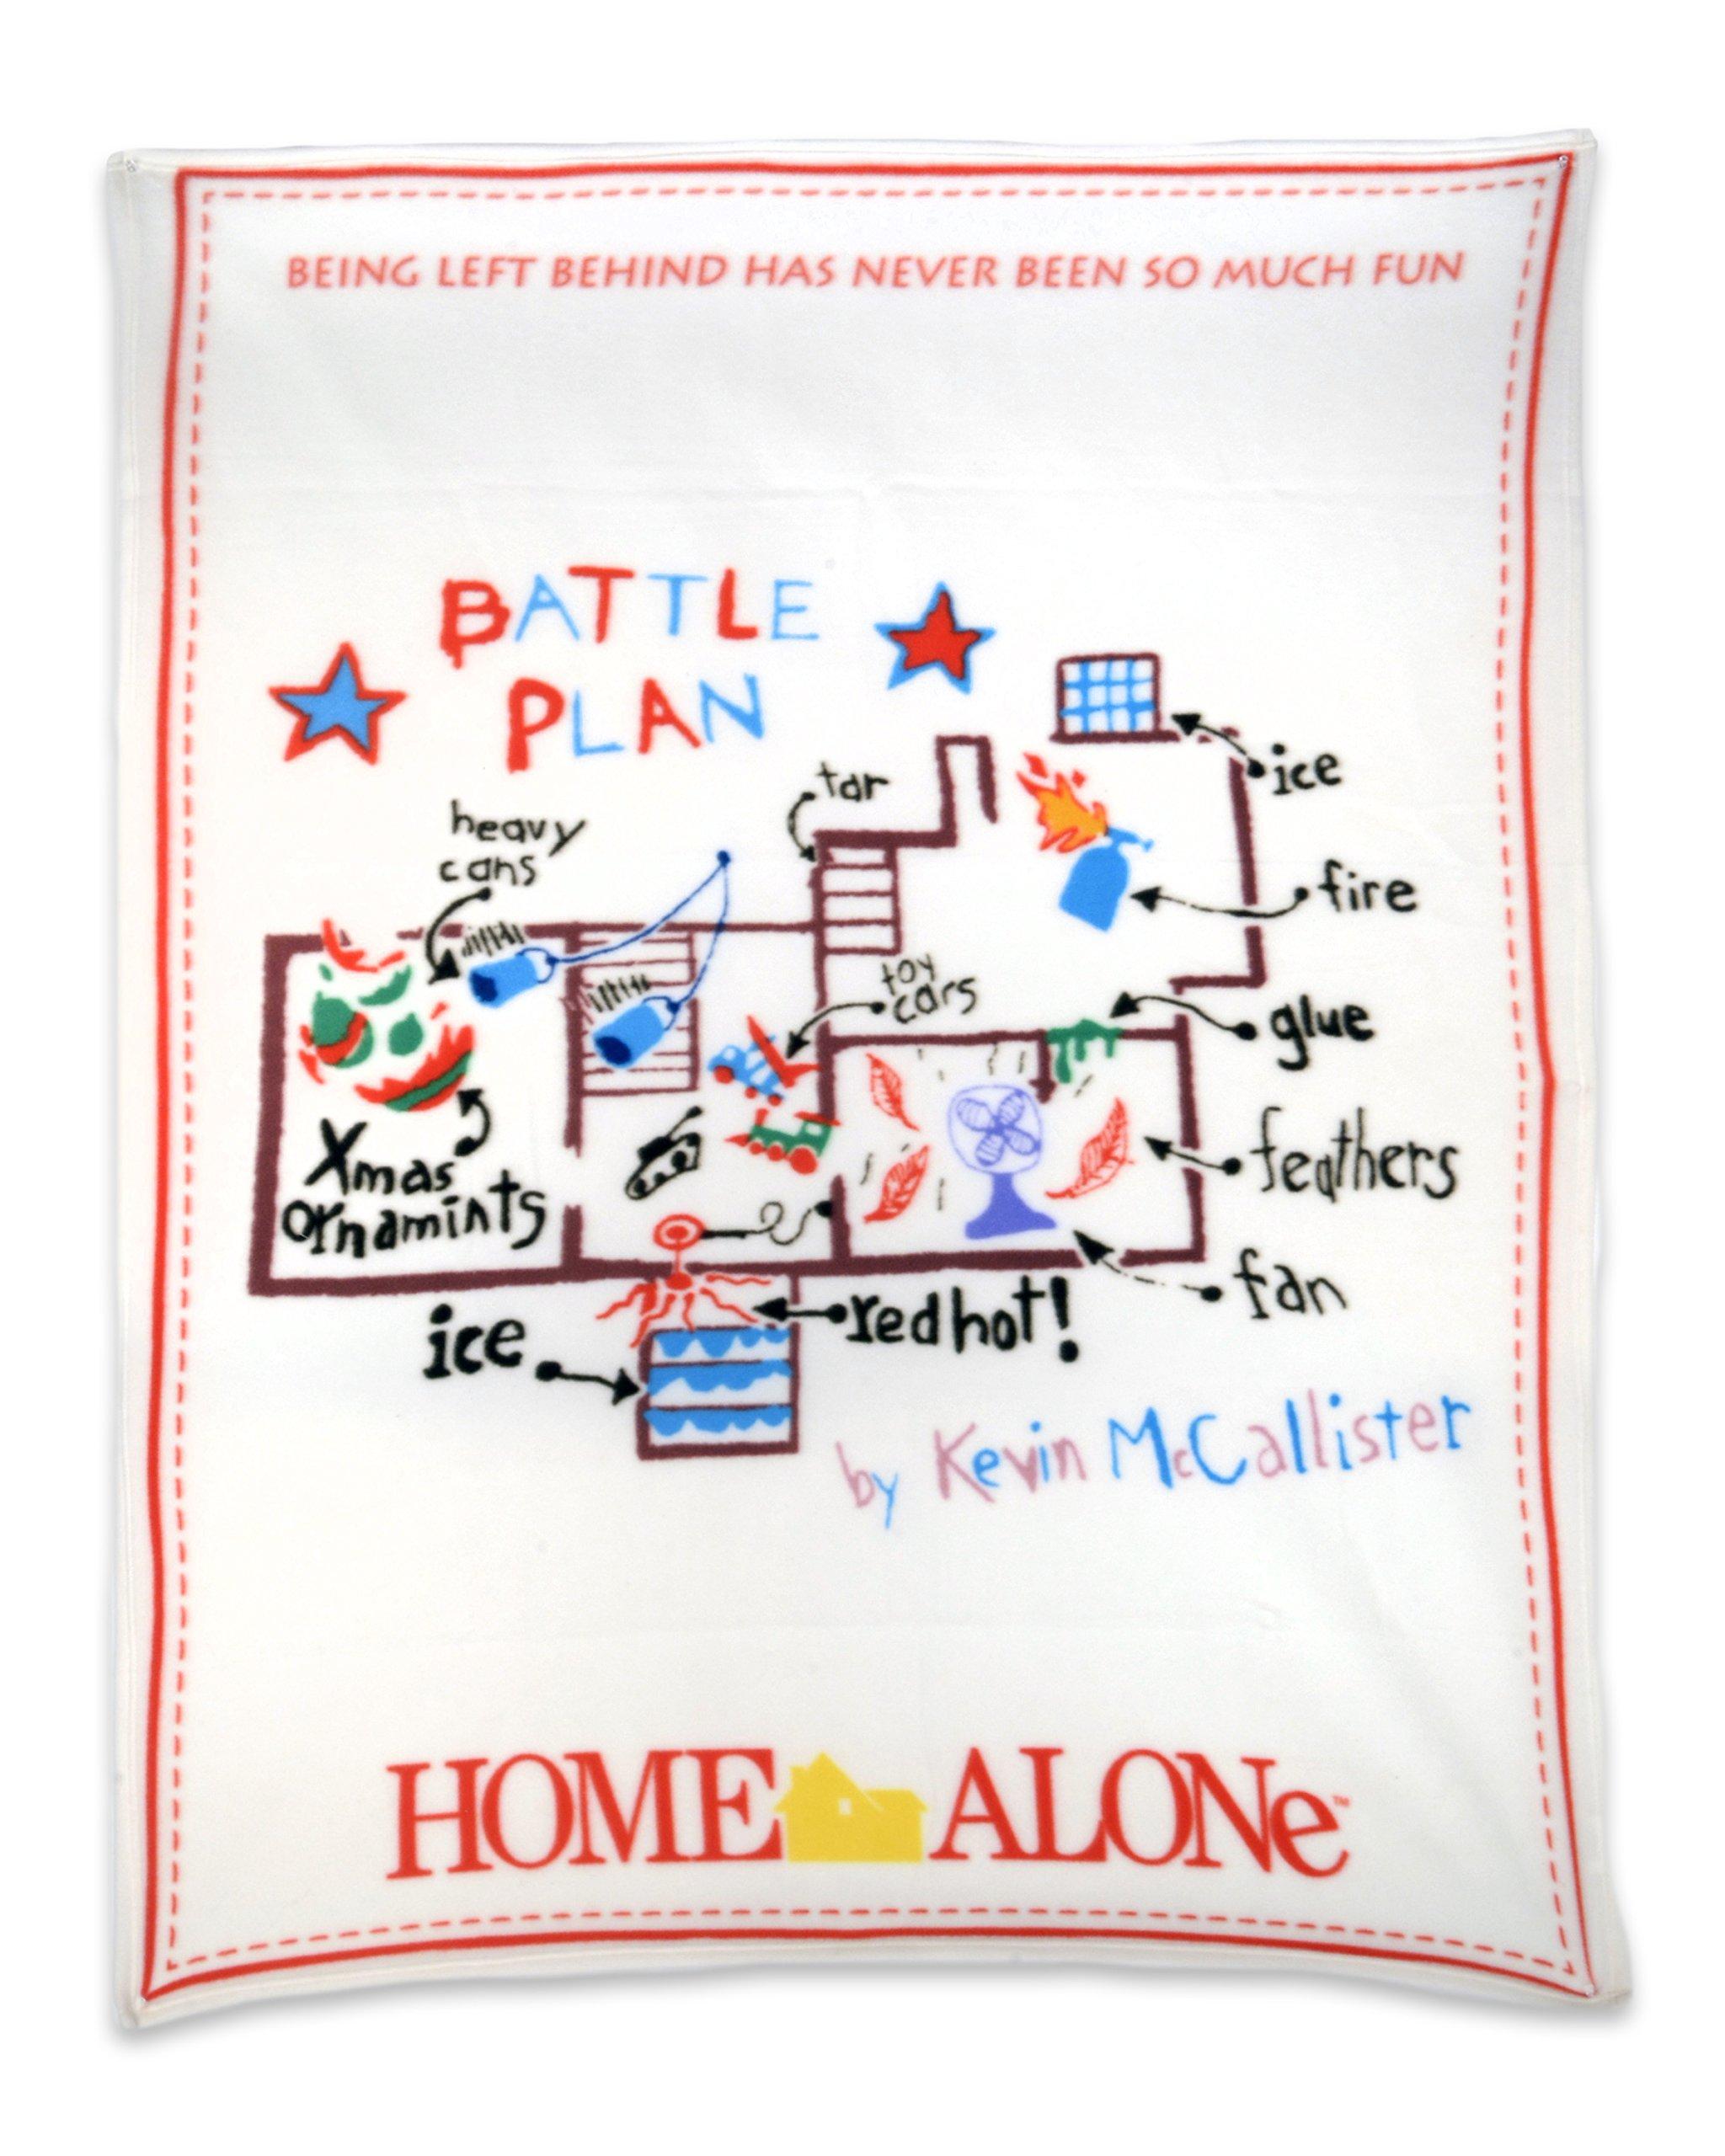 NECA Home Alone Fleece Throw Battle Plan Fleece Blanket